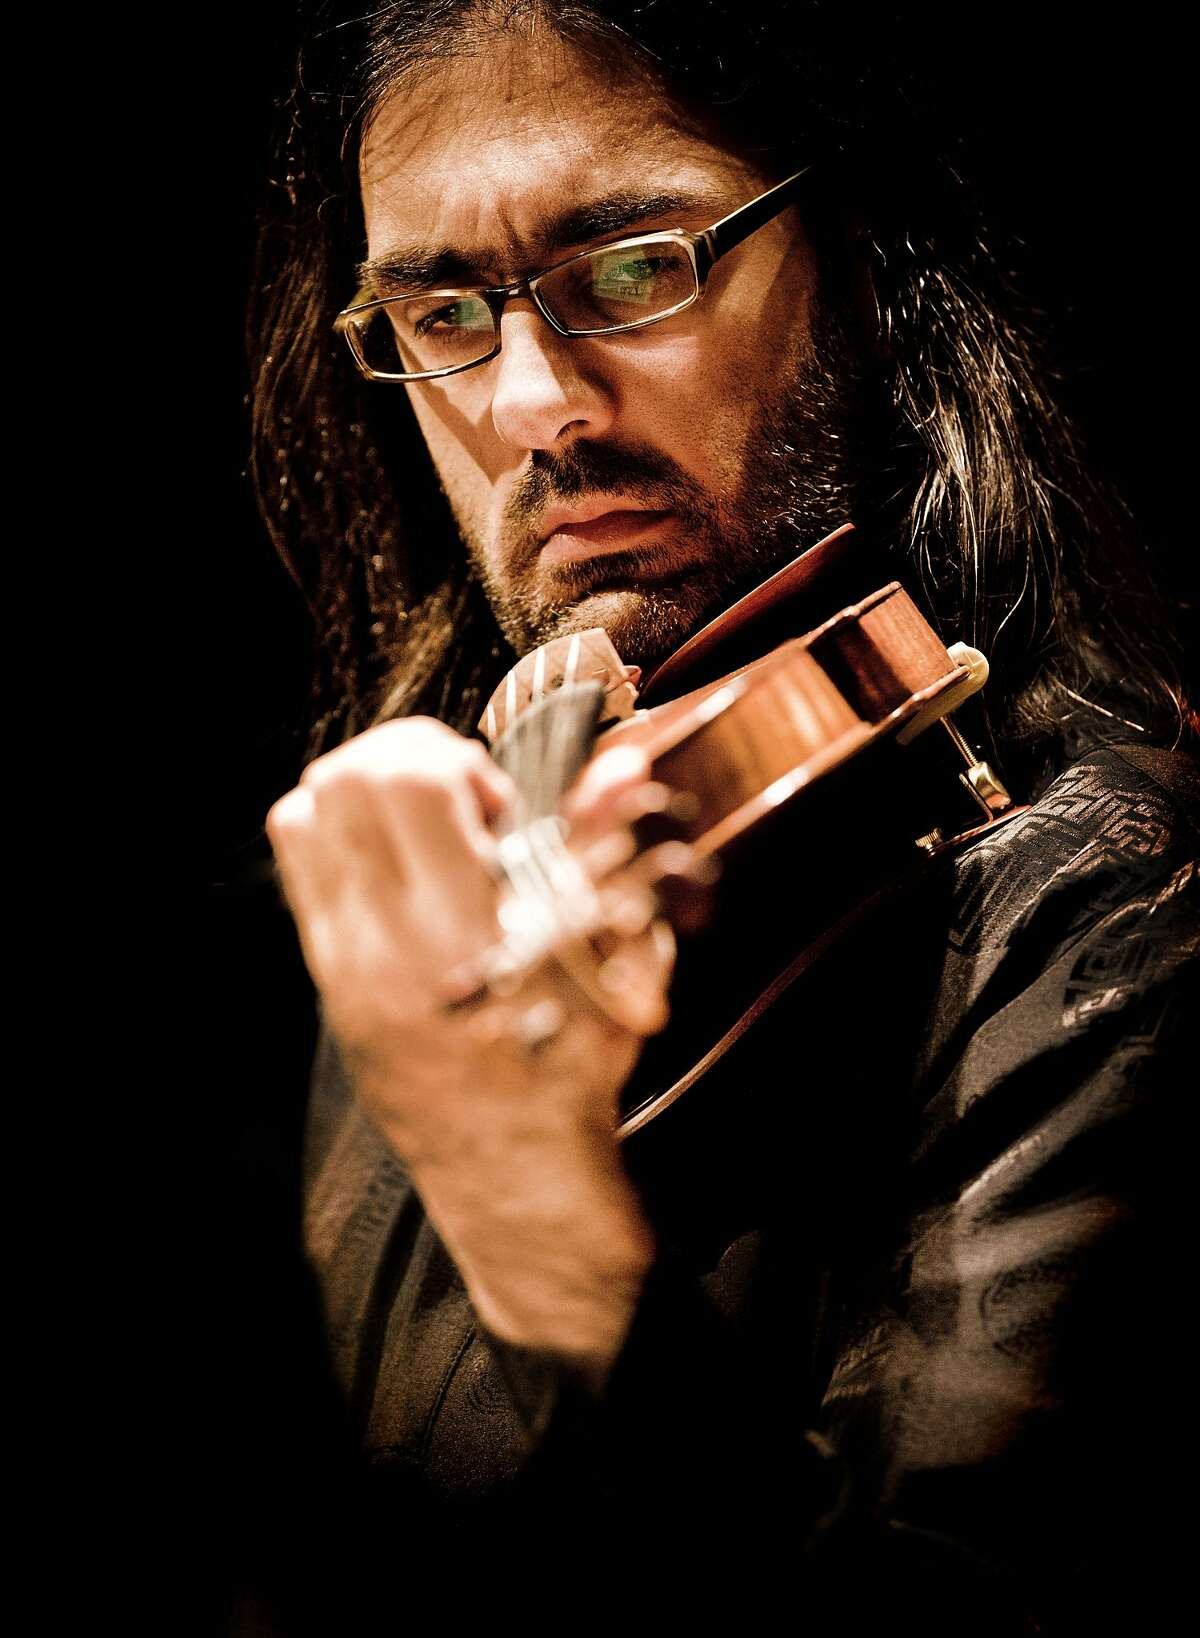 Violinist Leonidas Kavakos Leonidas Kavakos Photo: Marco Borggreve